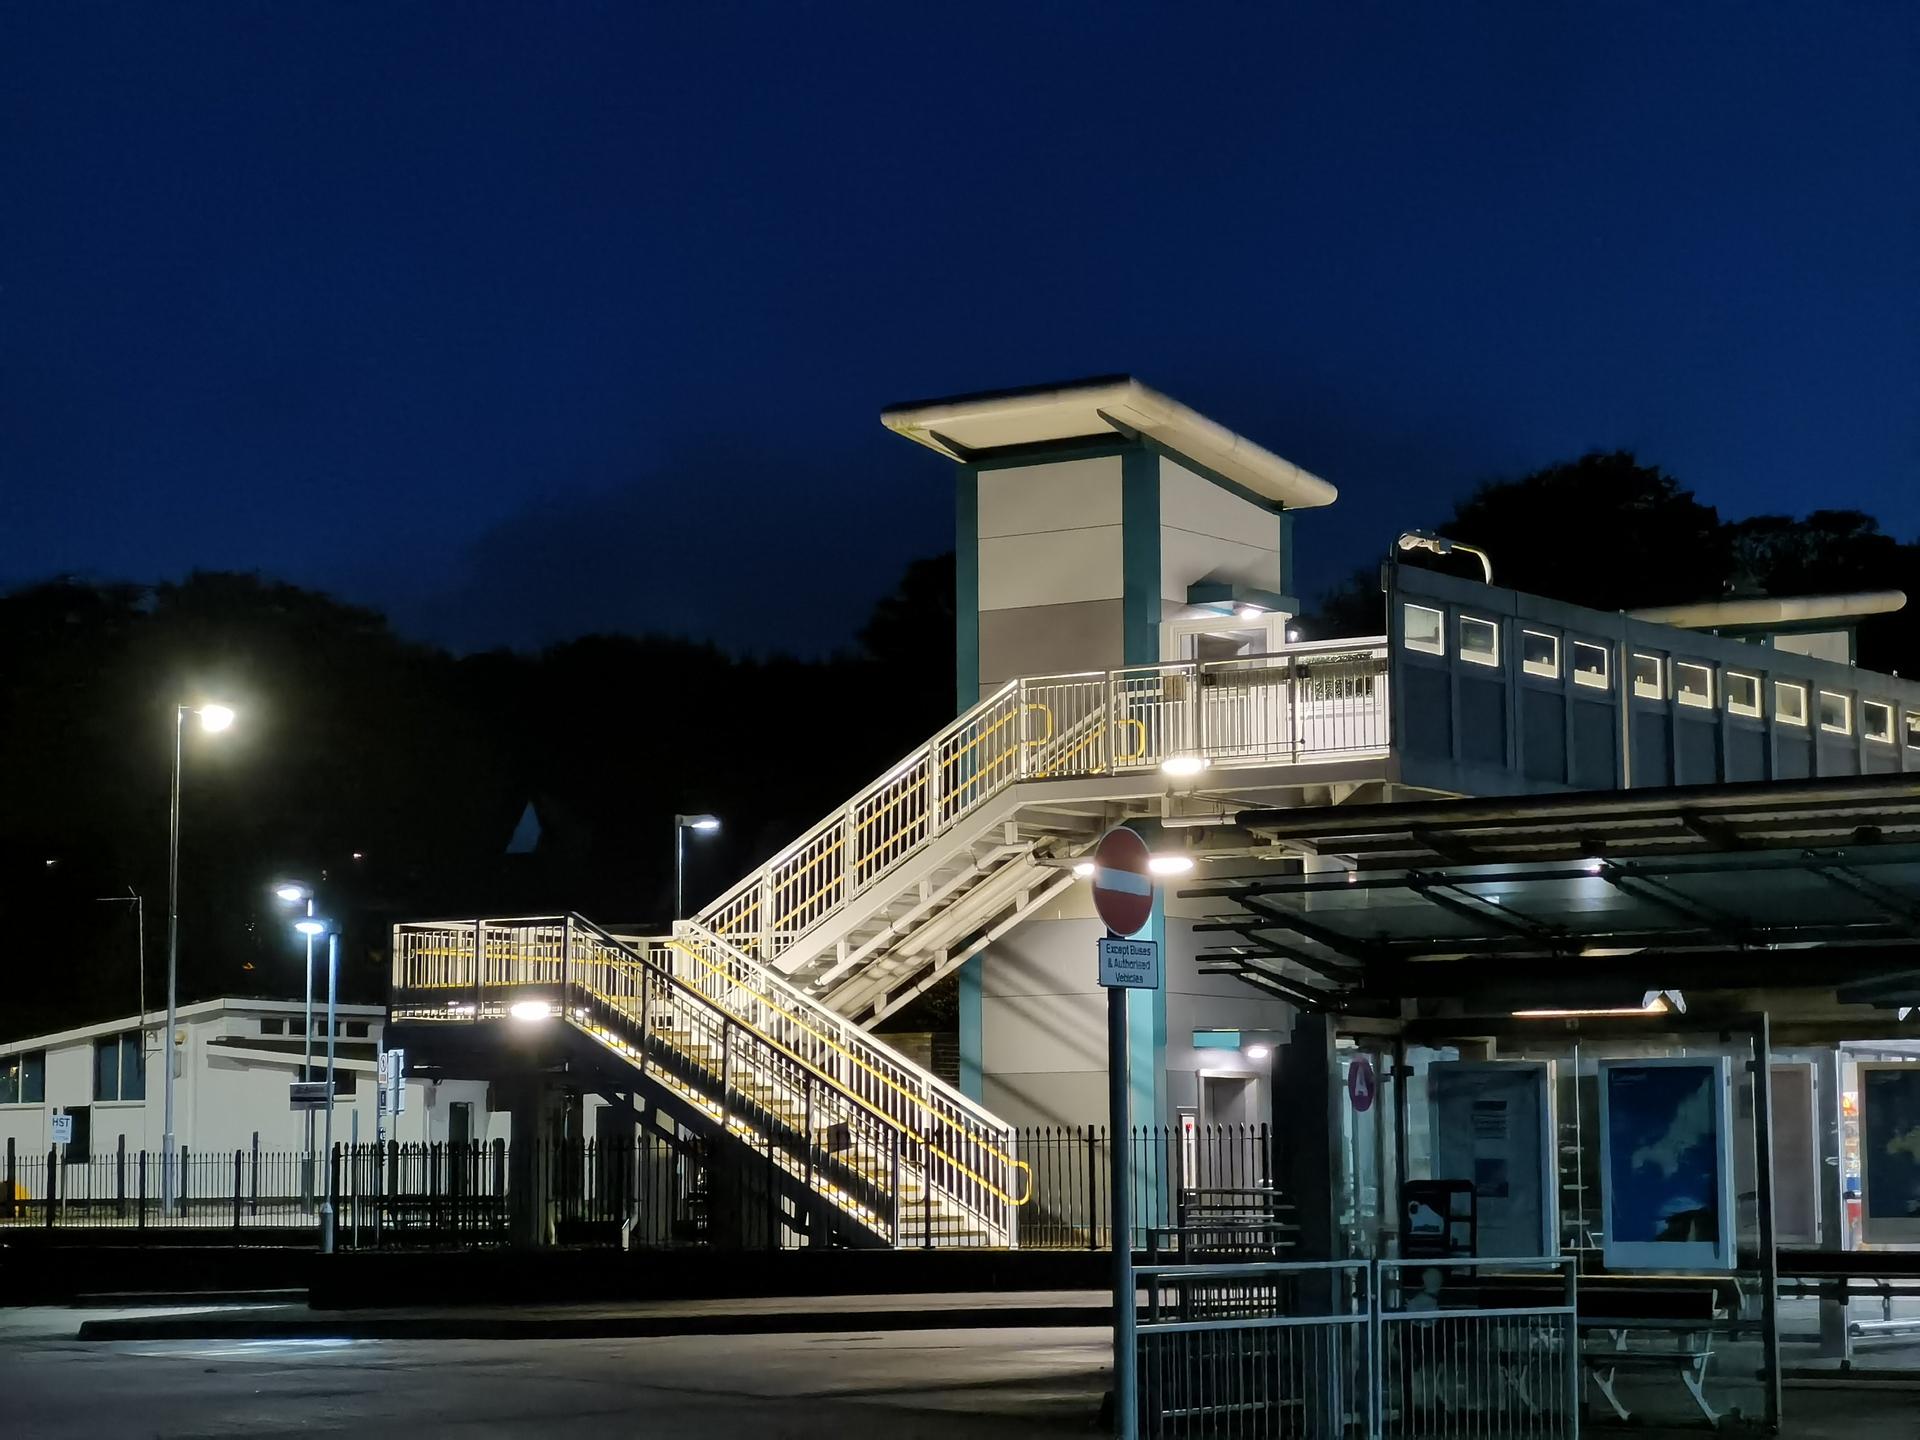 Huawei Mate 30 Pro Camera test Night shot 3x zoom of train station bridge in low light